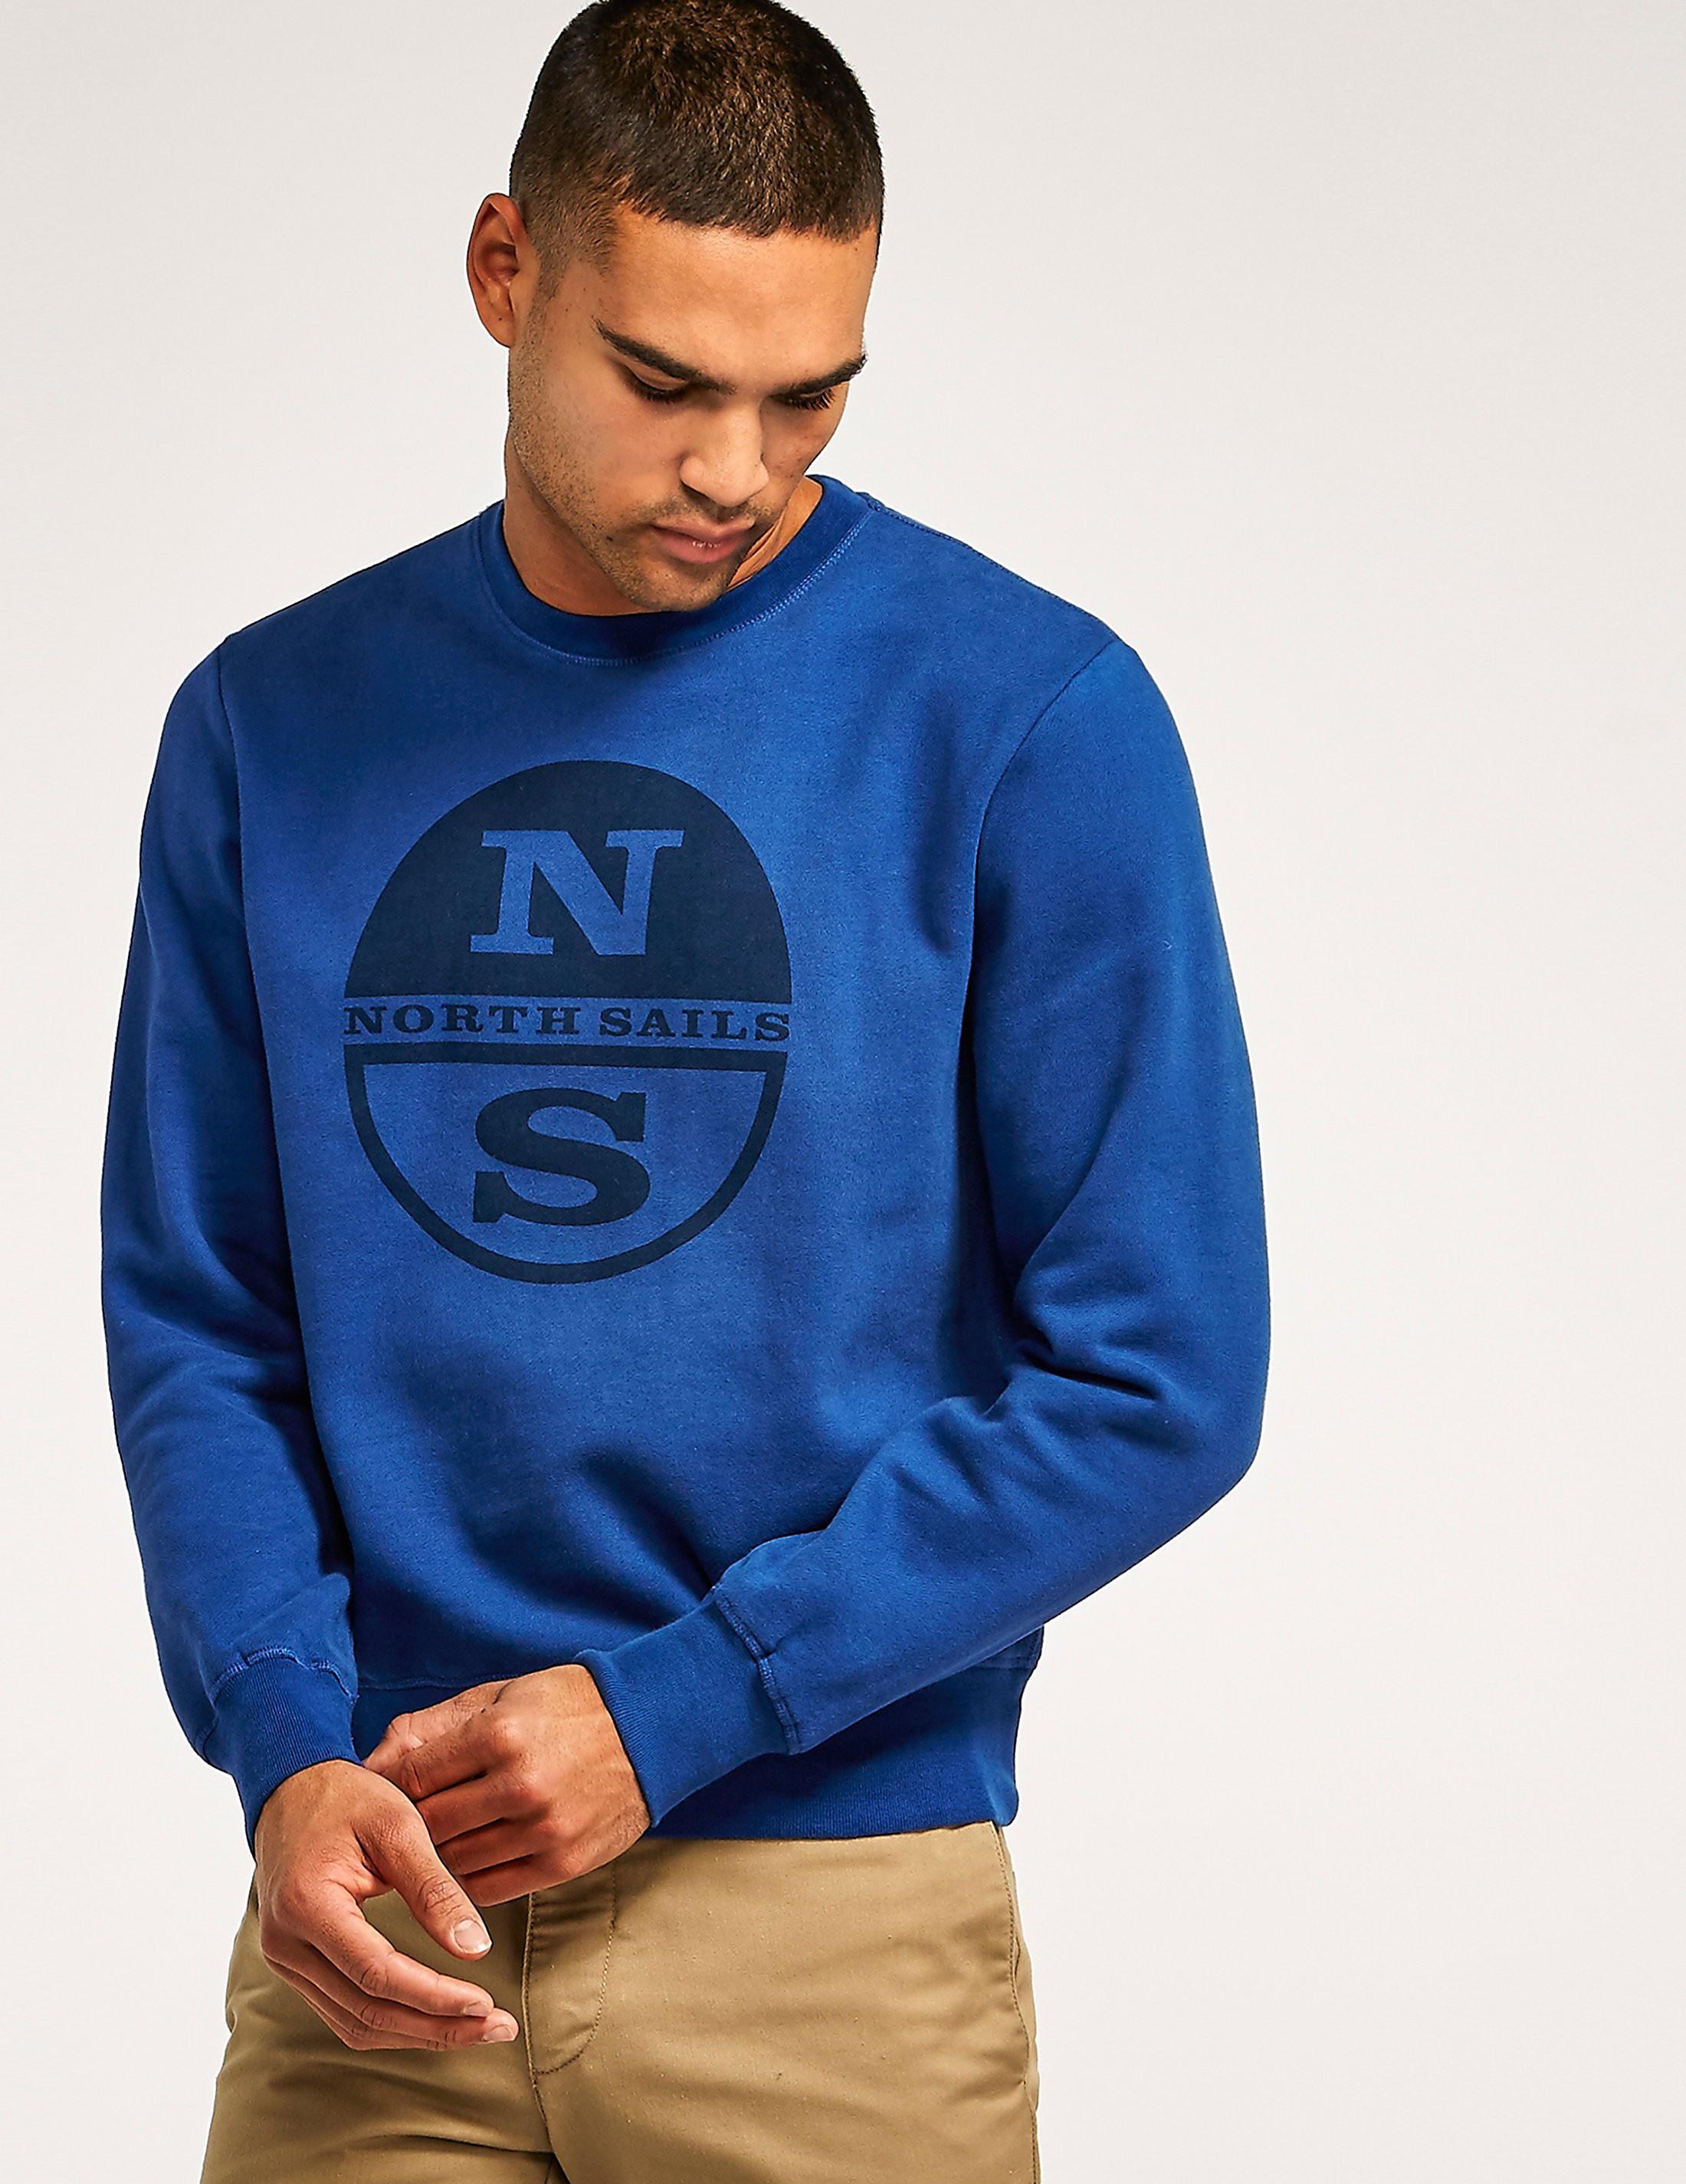 NORTH SAILS Ian Crew Neck Sweat